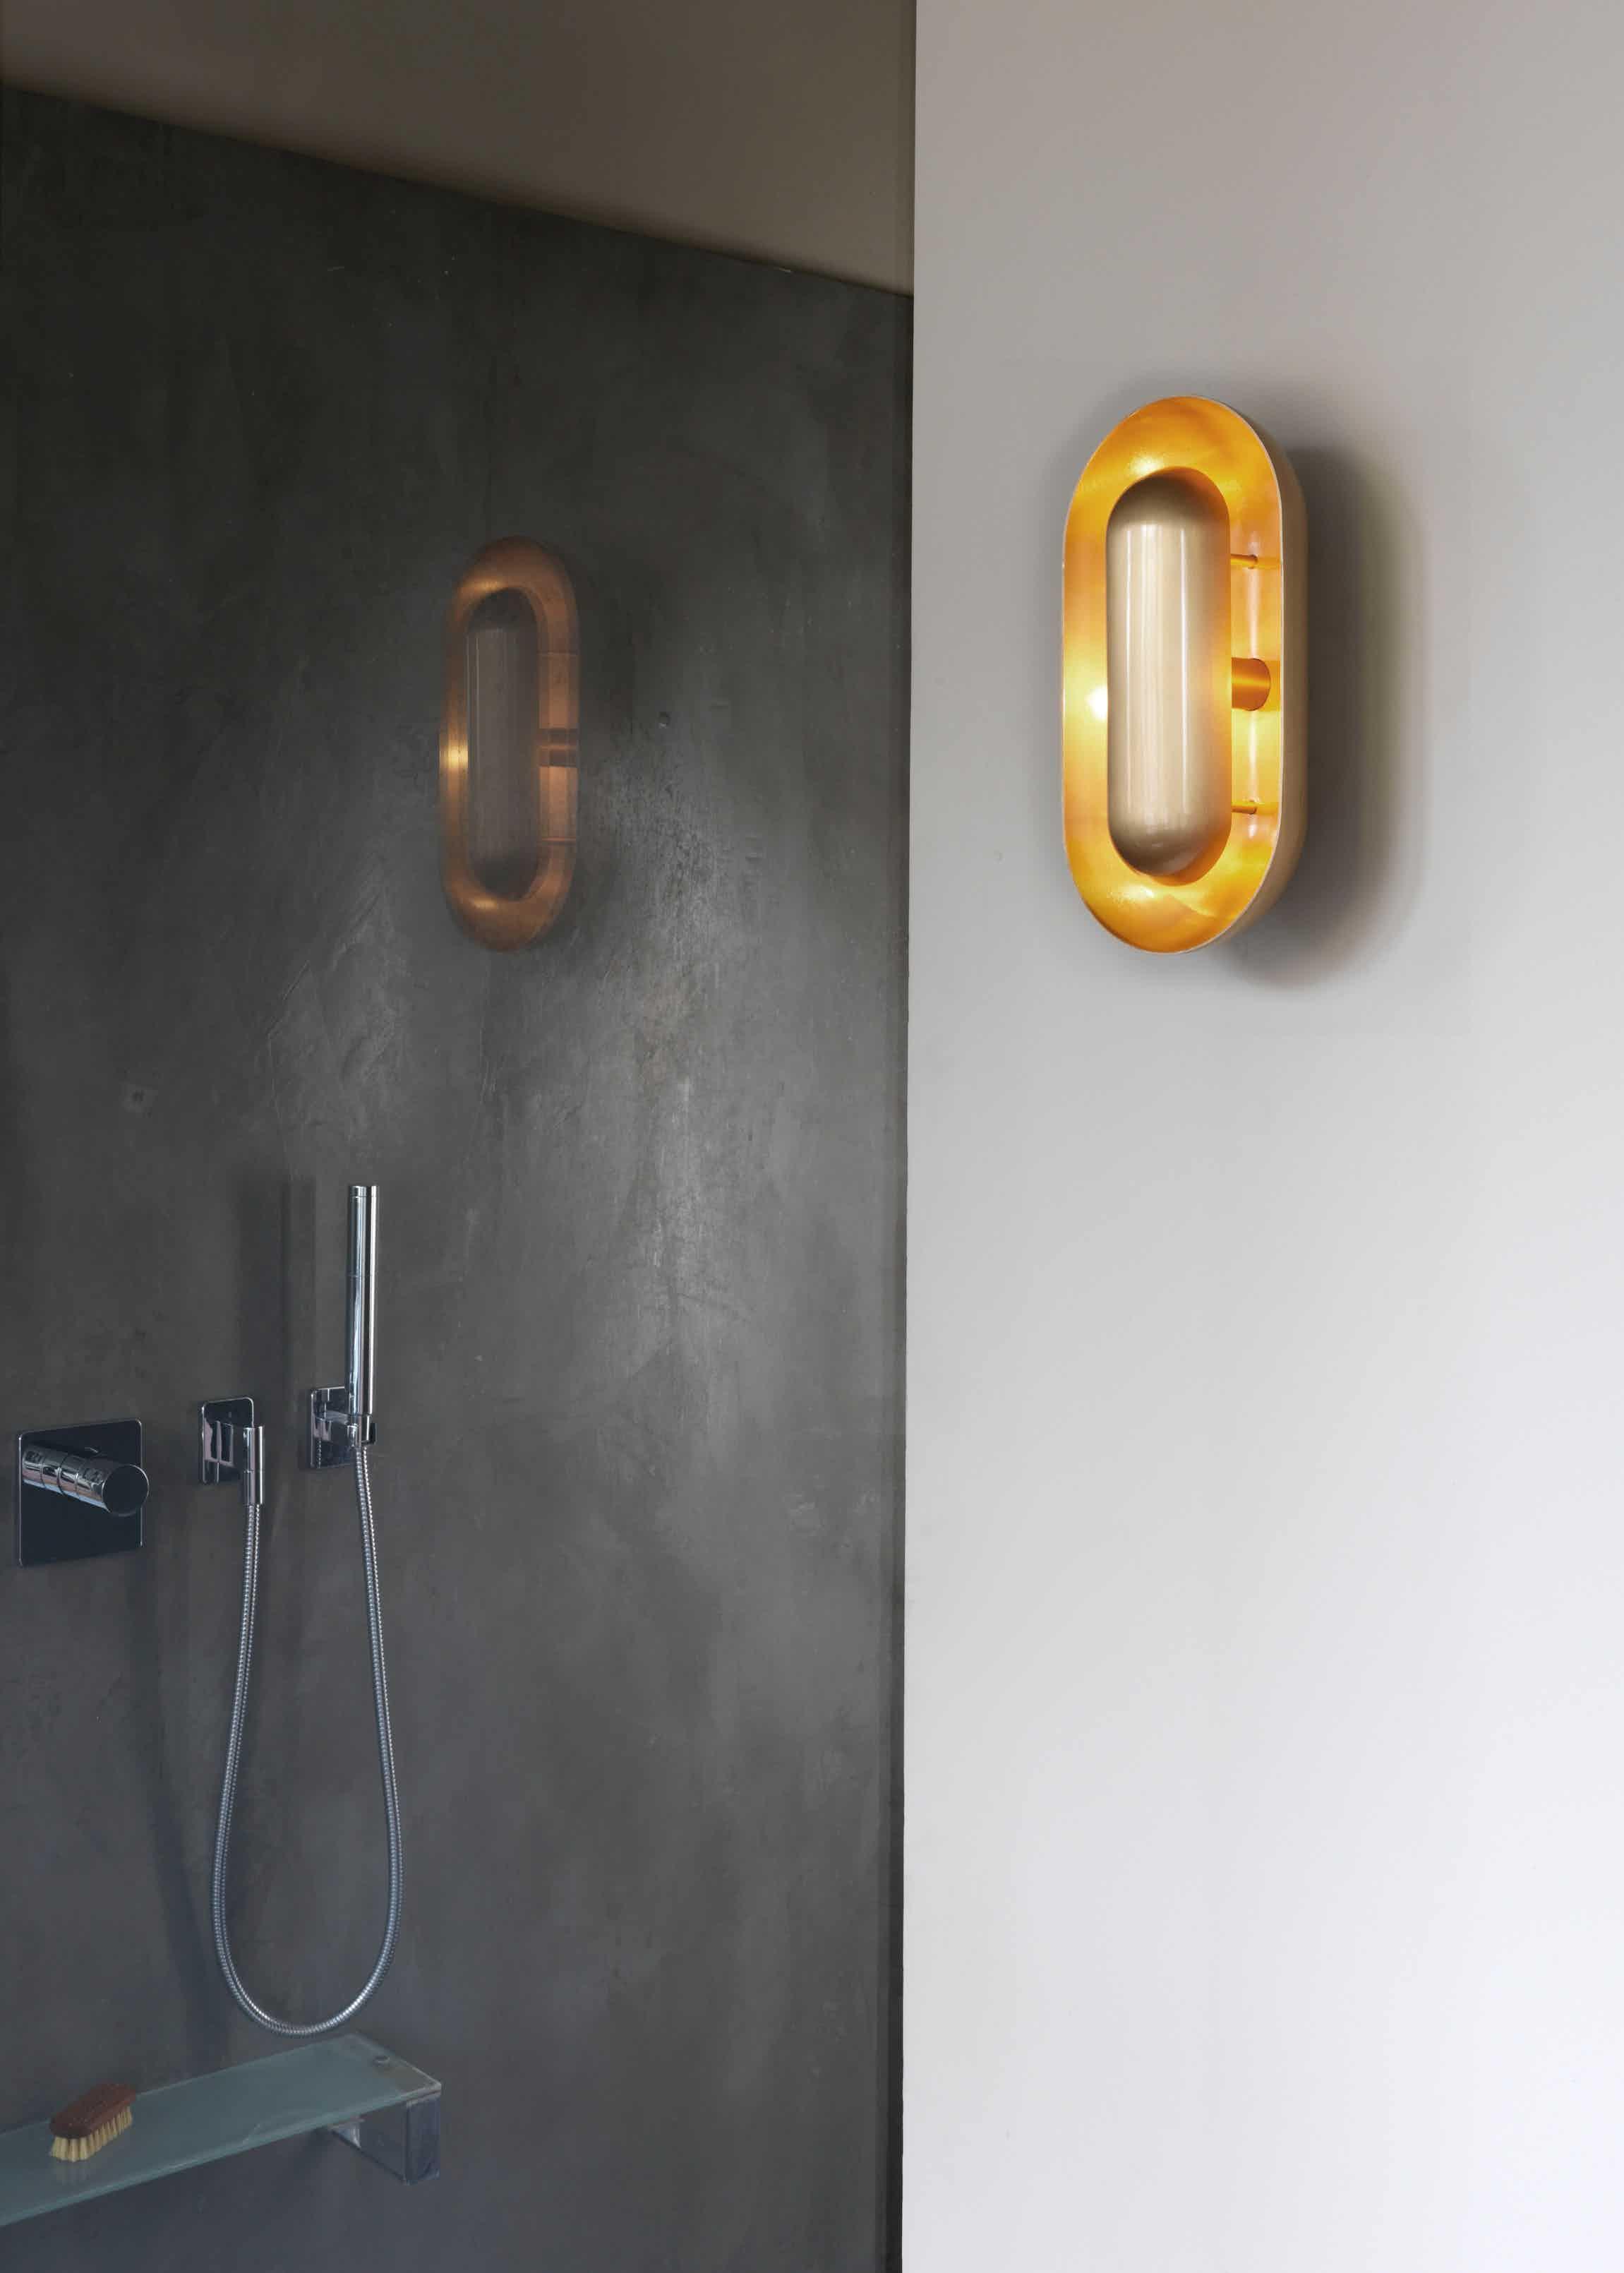 Cto Lighting Capsule Wall Insitu Haute Living